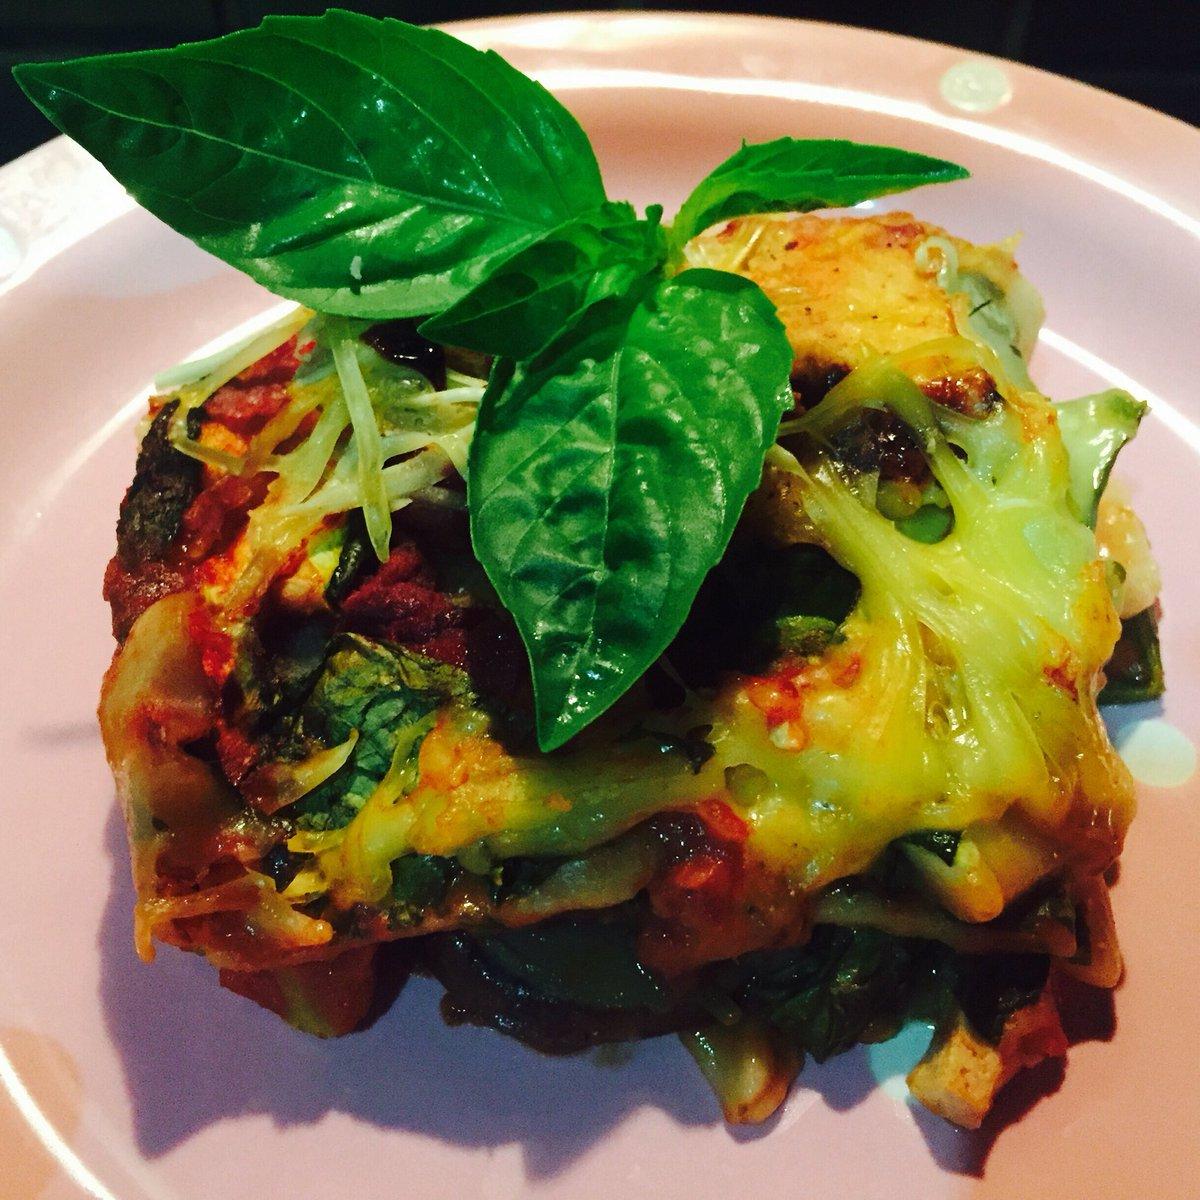 Home made #vegan #glutenfree lasagne - beautiful. Thanks to @ArtofZenFoods for the lush #cheese